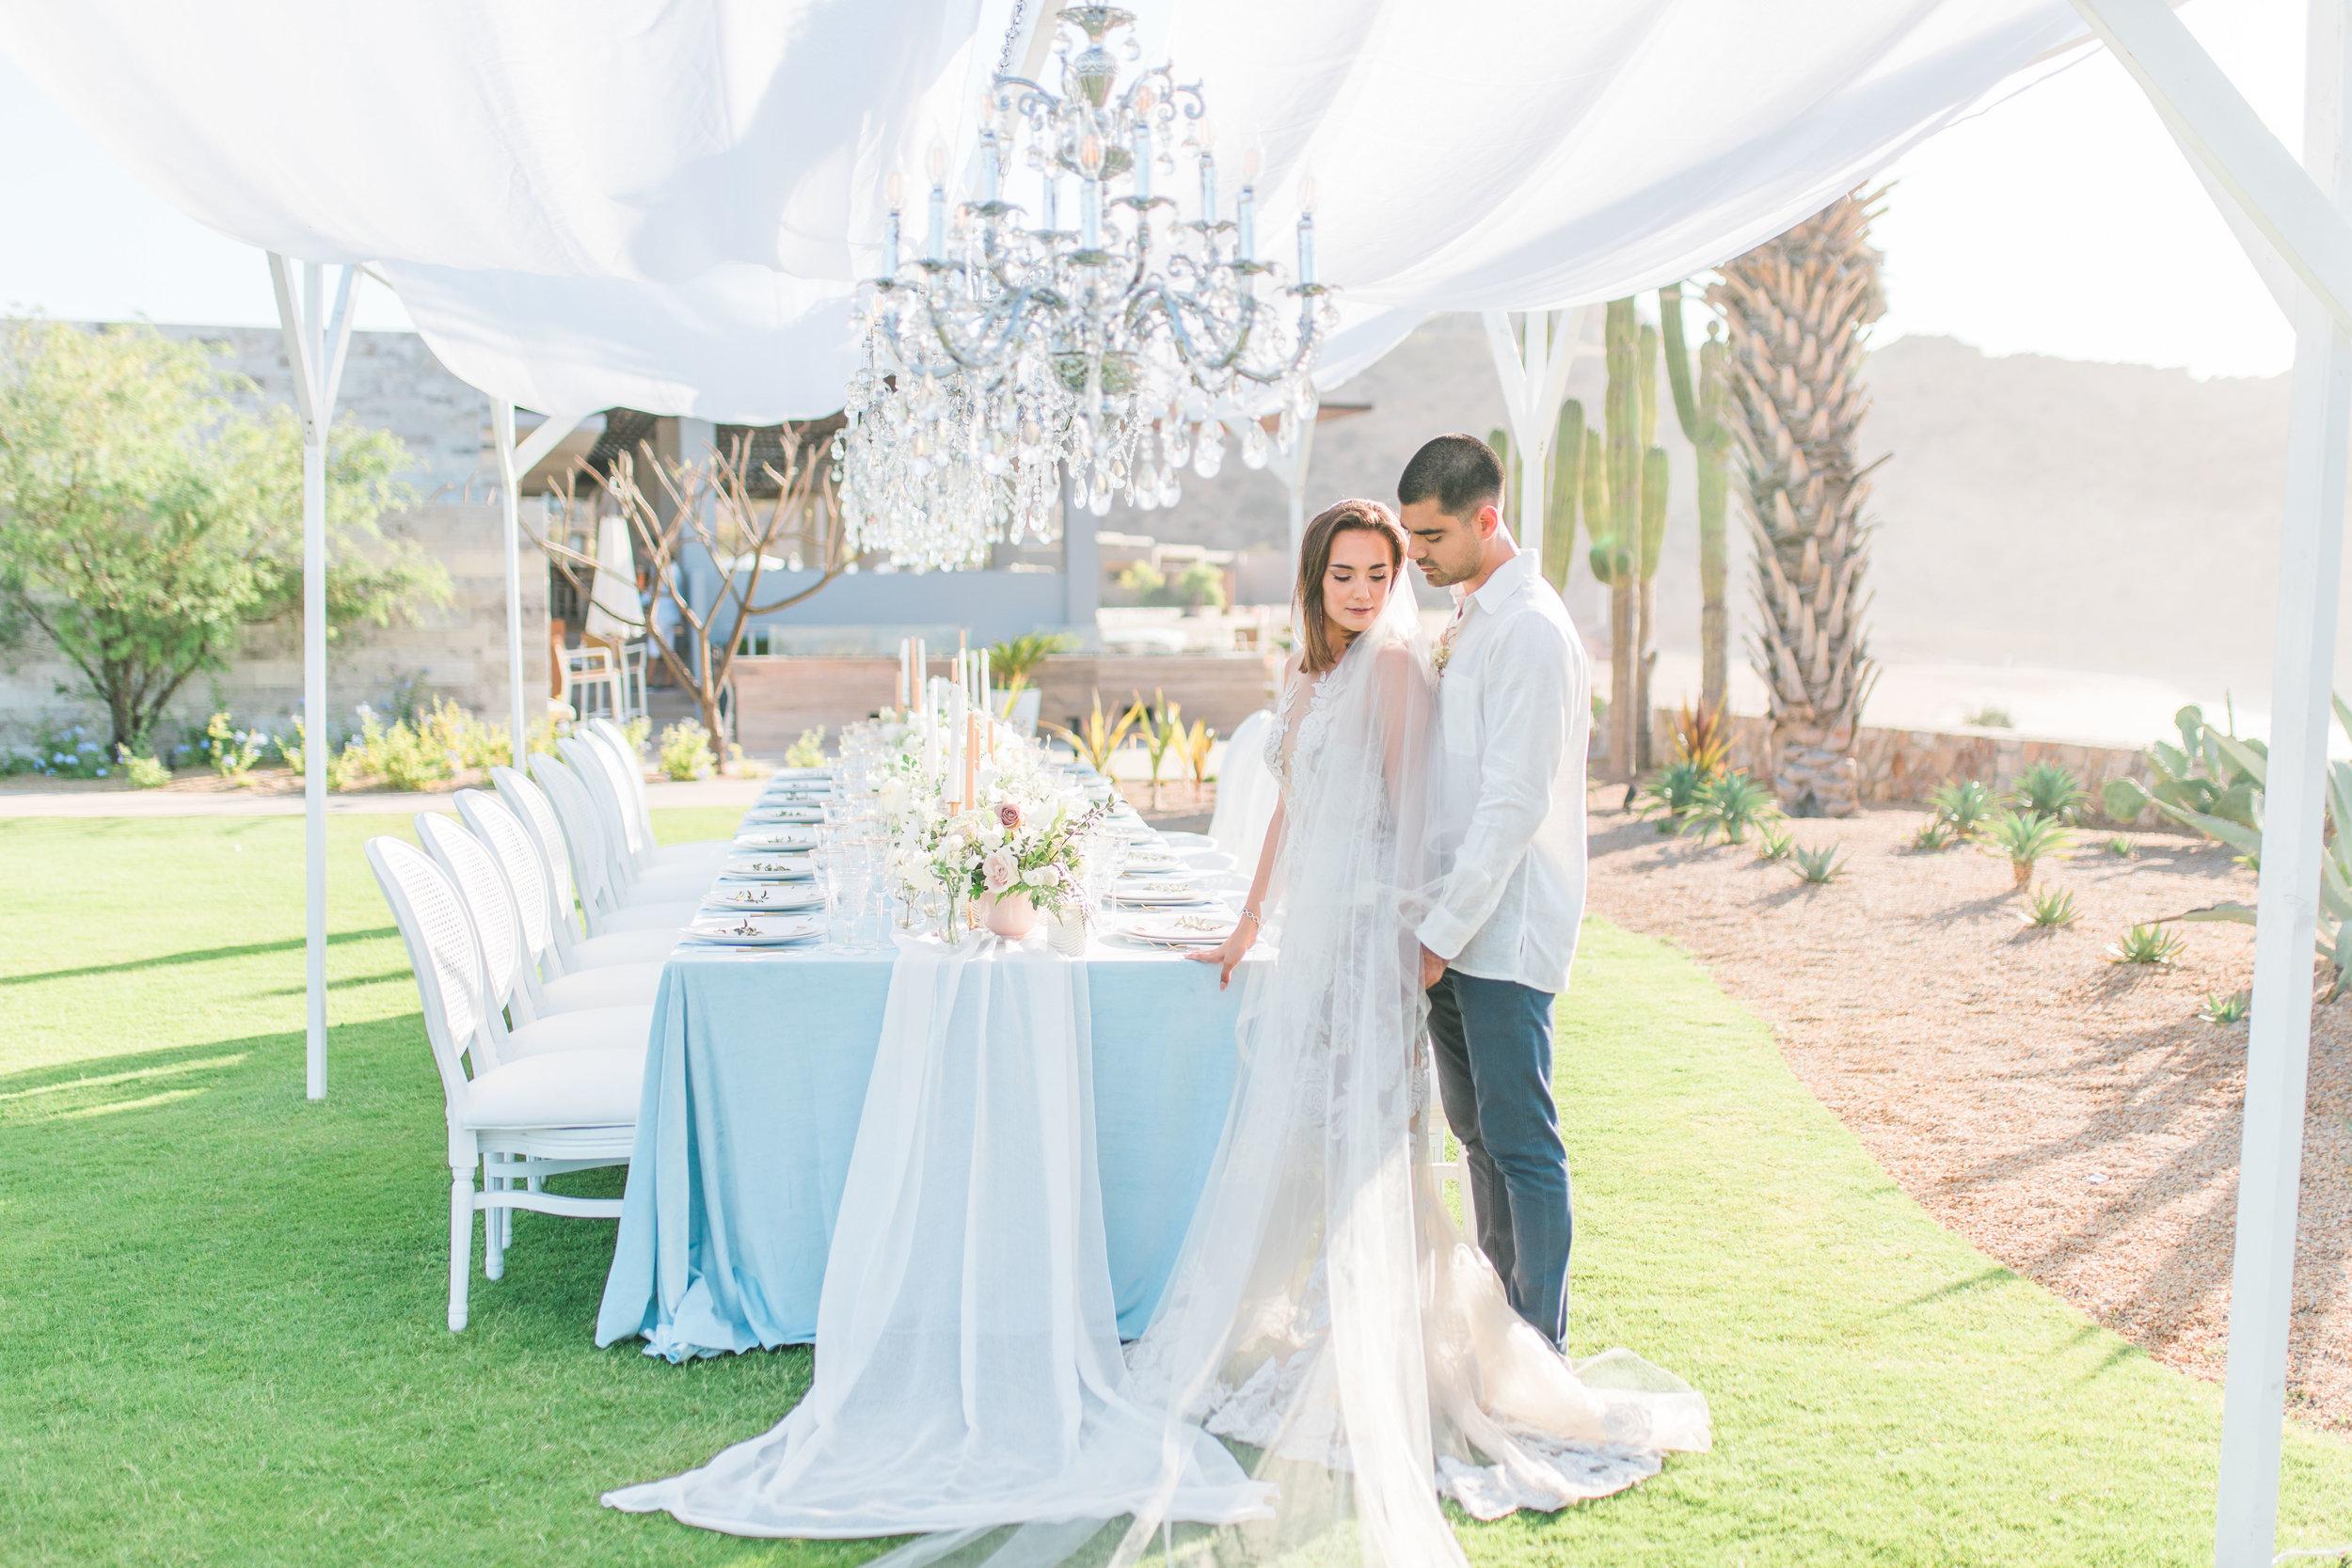 Montage-Cabo-Wedding-Photos-JBJ-Pictures-35.jpg